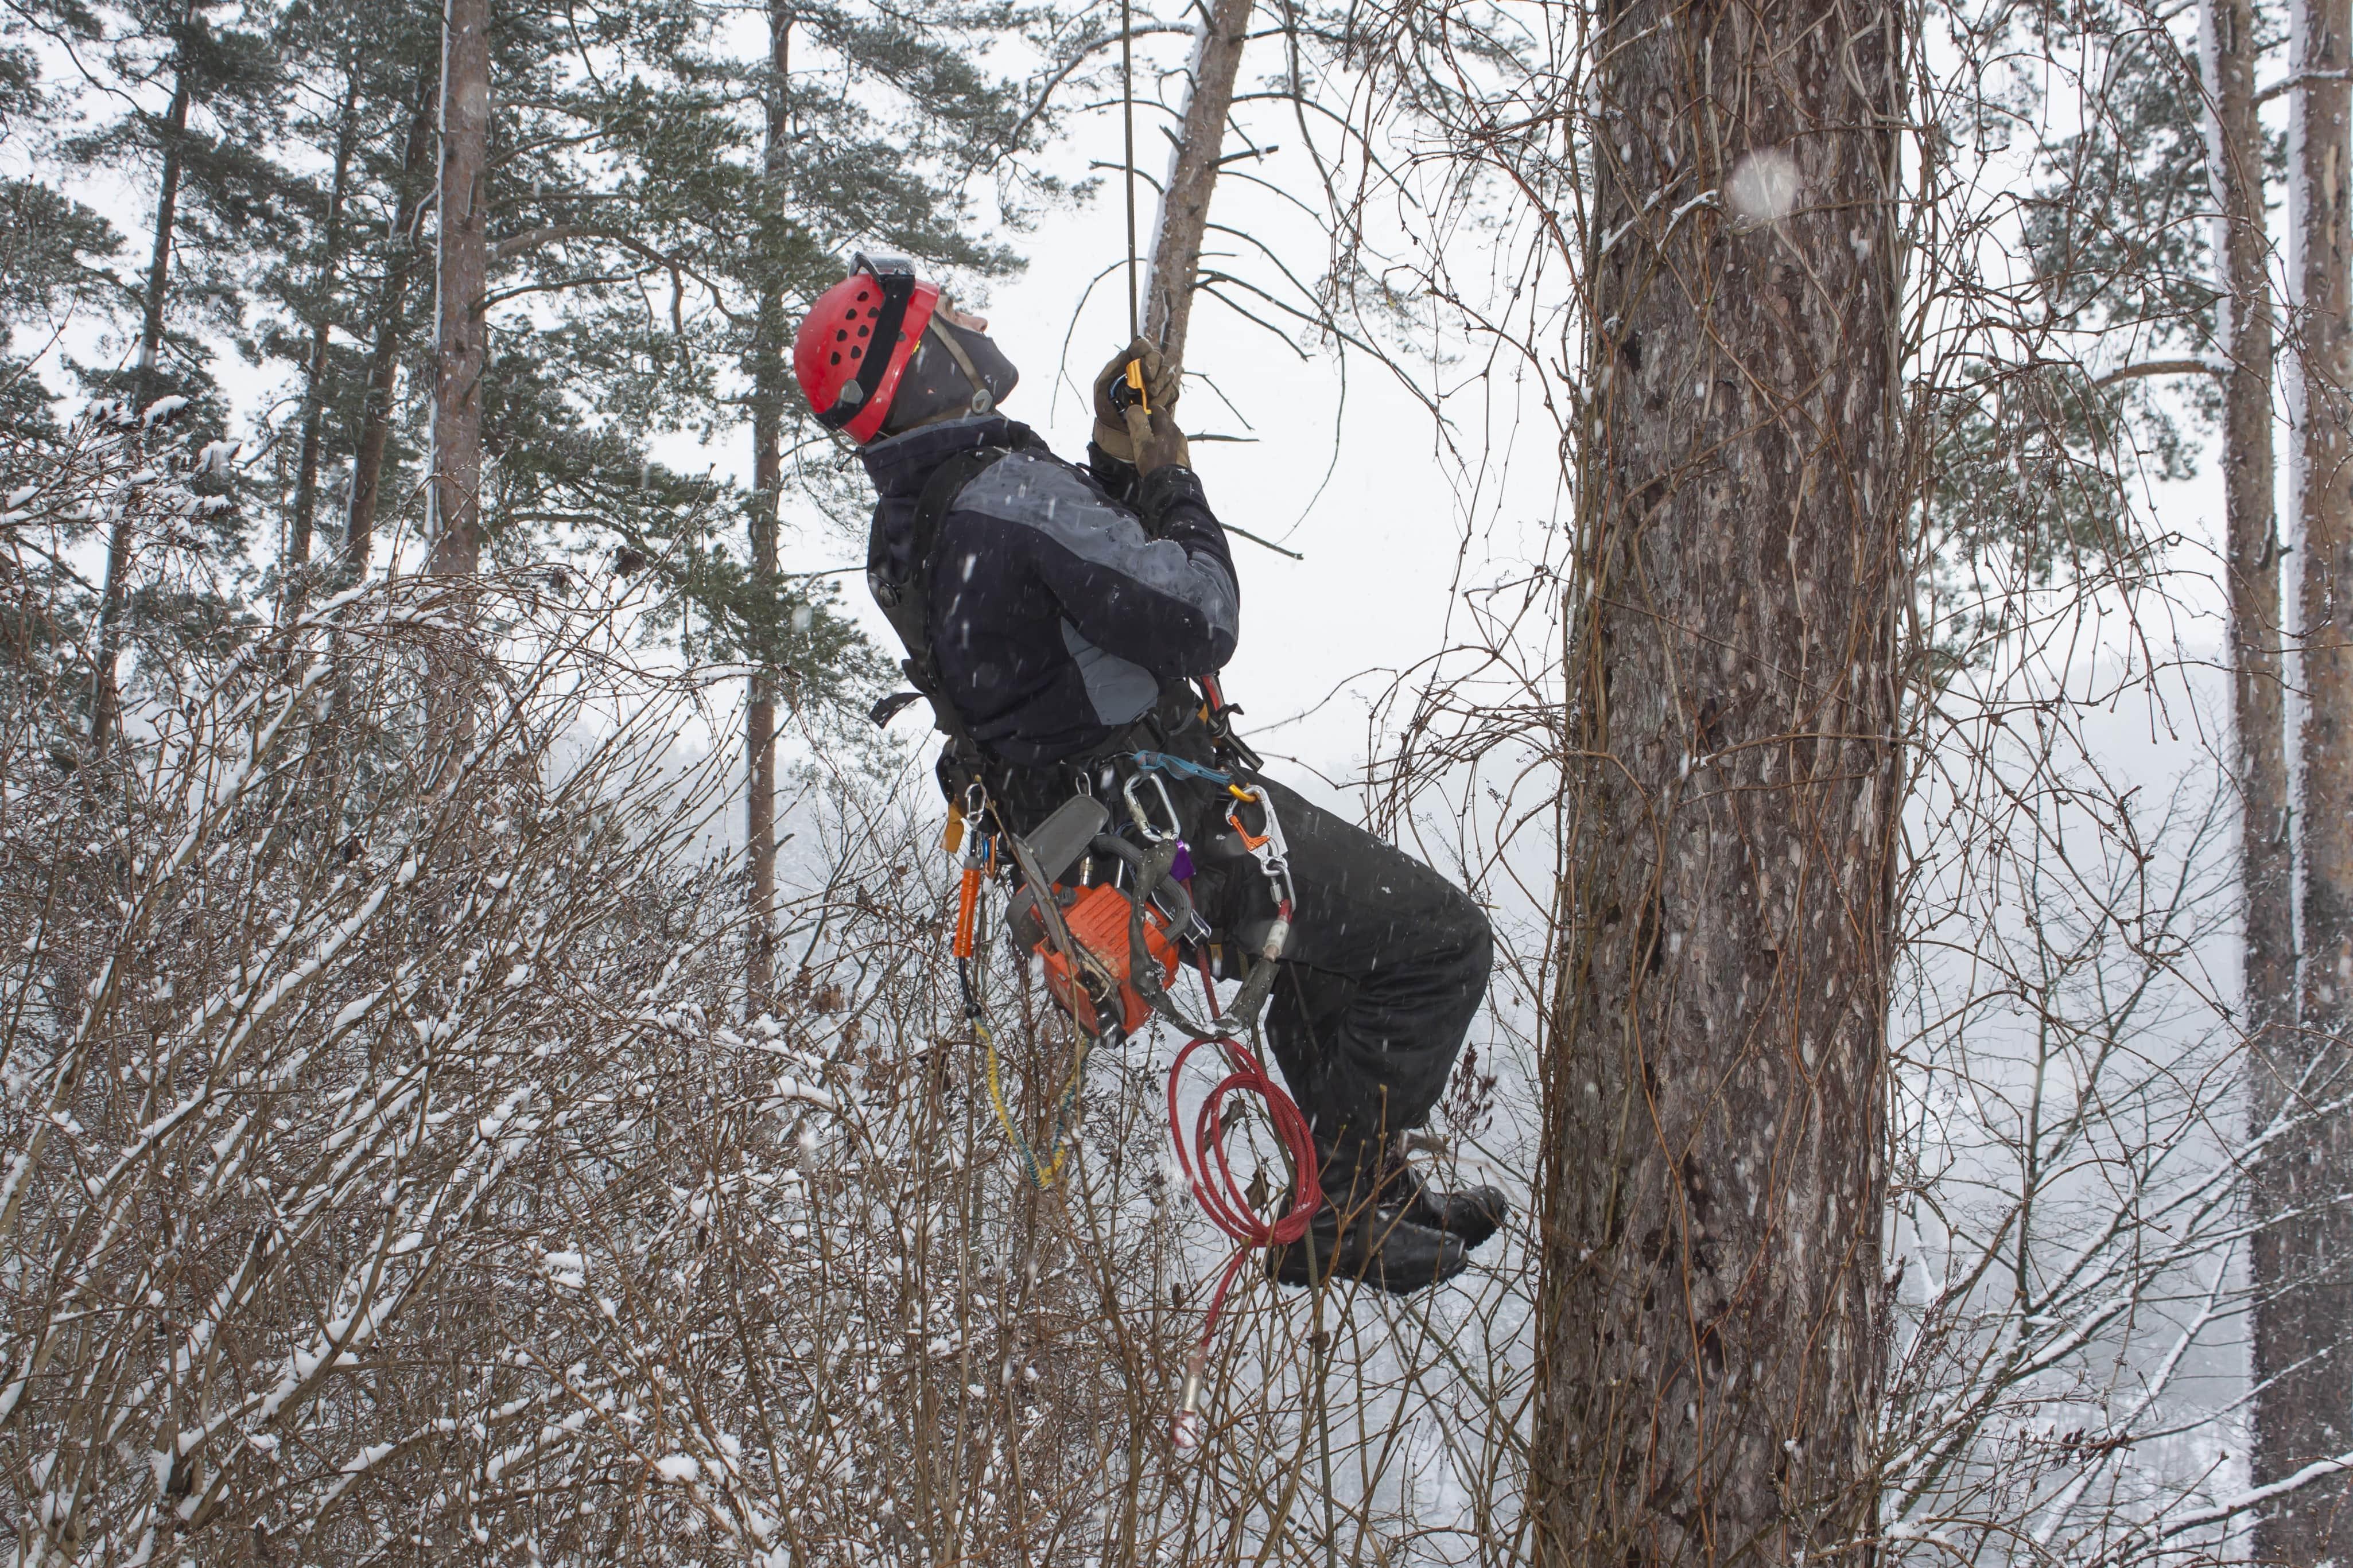 Arborist hanging from Tree in Snow